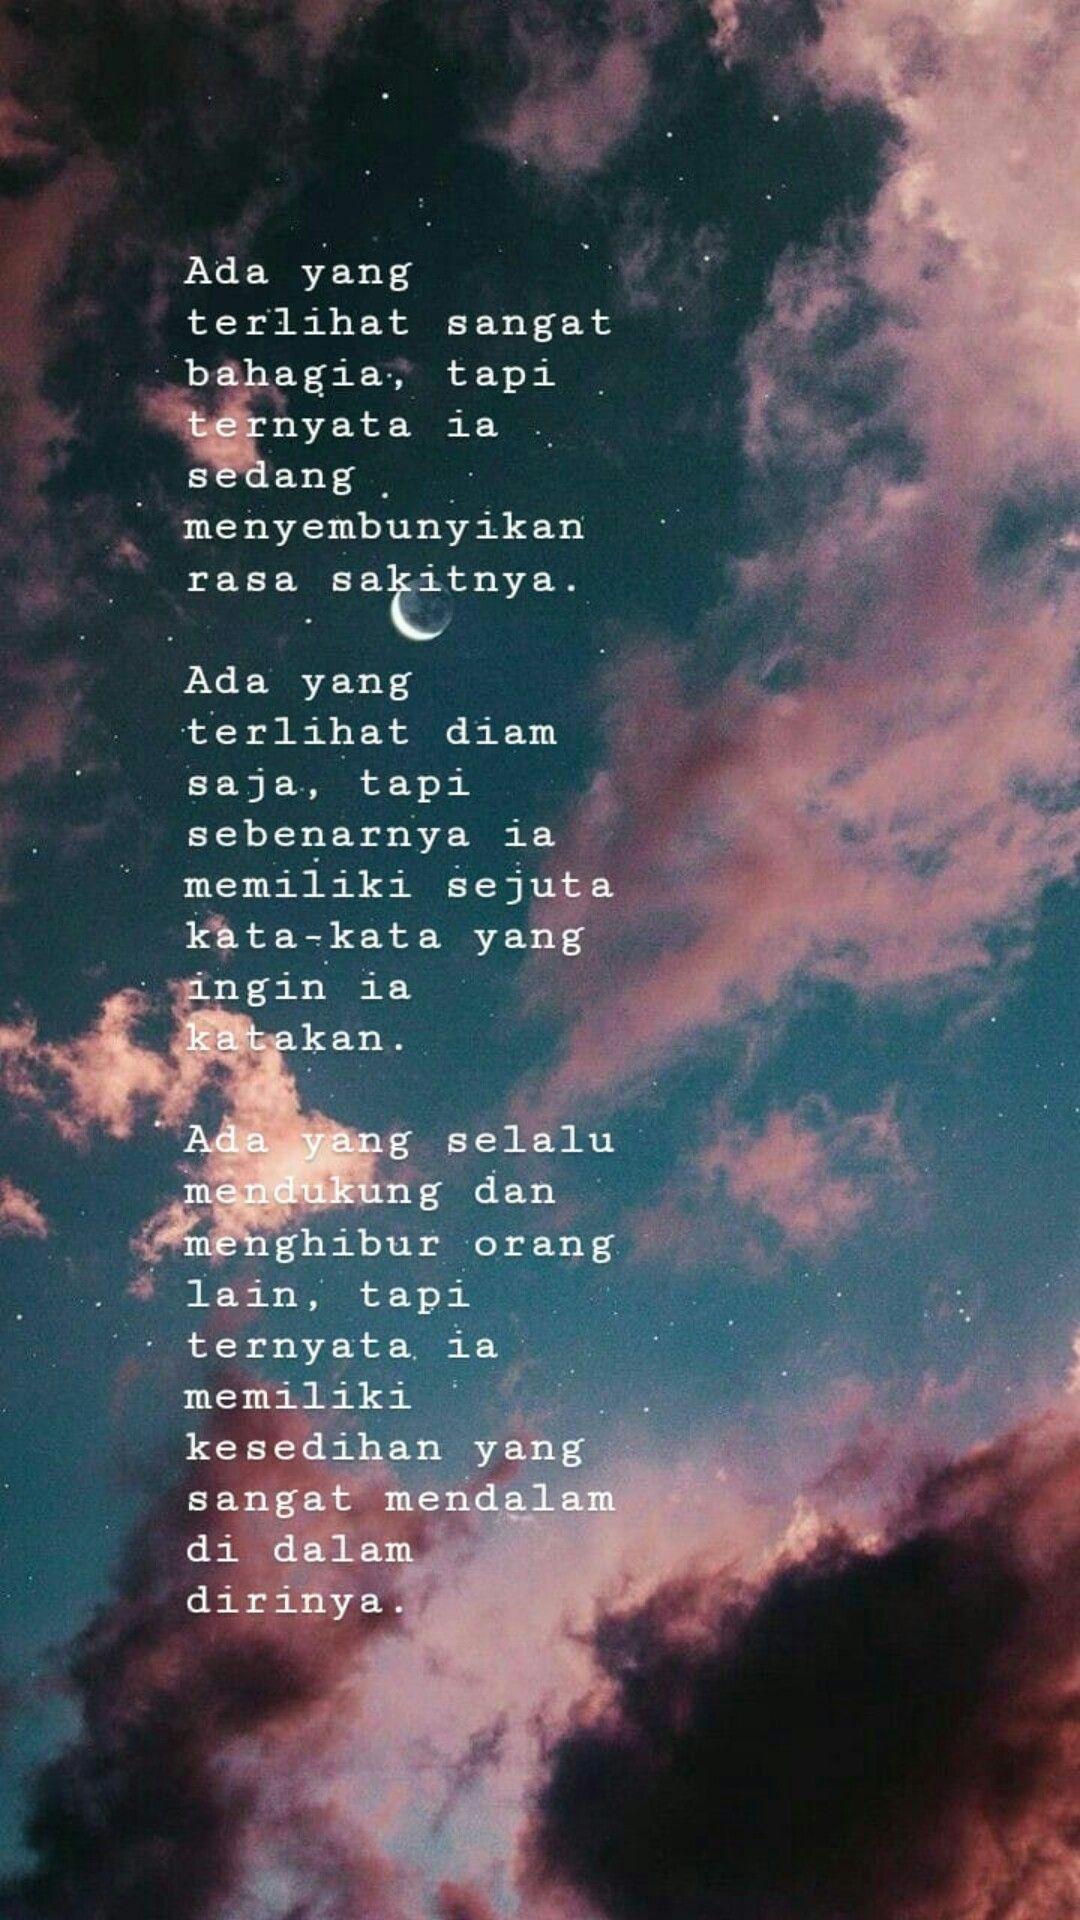 Pin By Bintang Novelia On B Pinterest Quotes Wattpad And Novel Tere Liye People